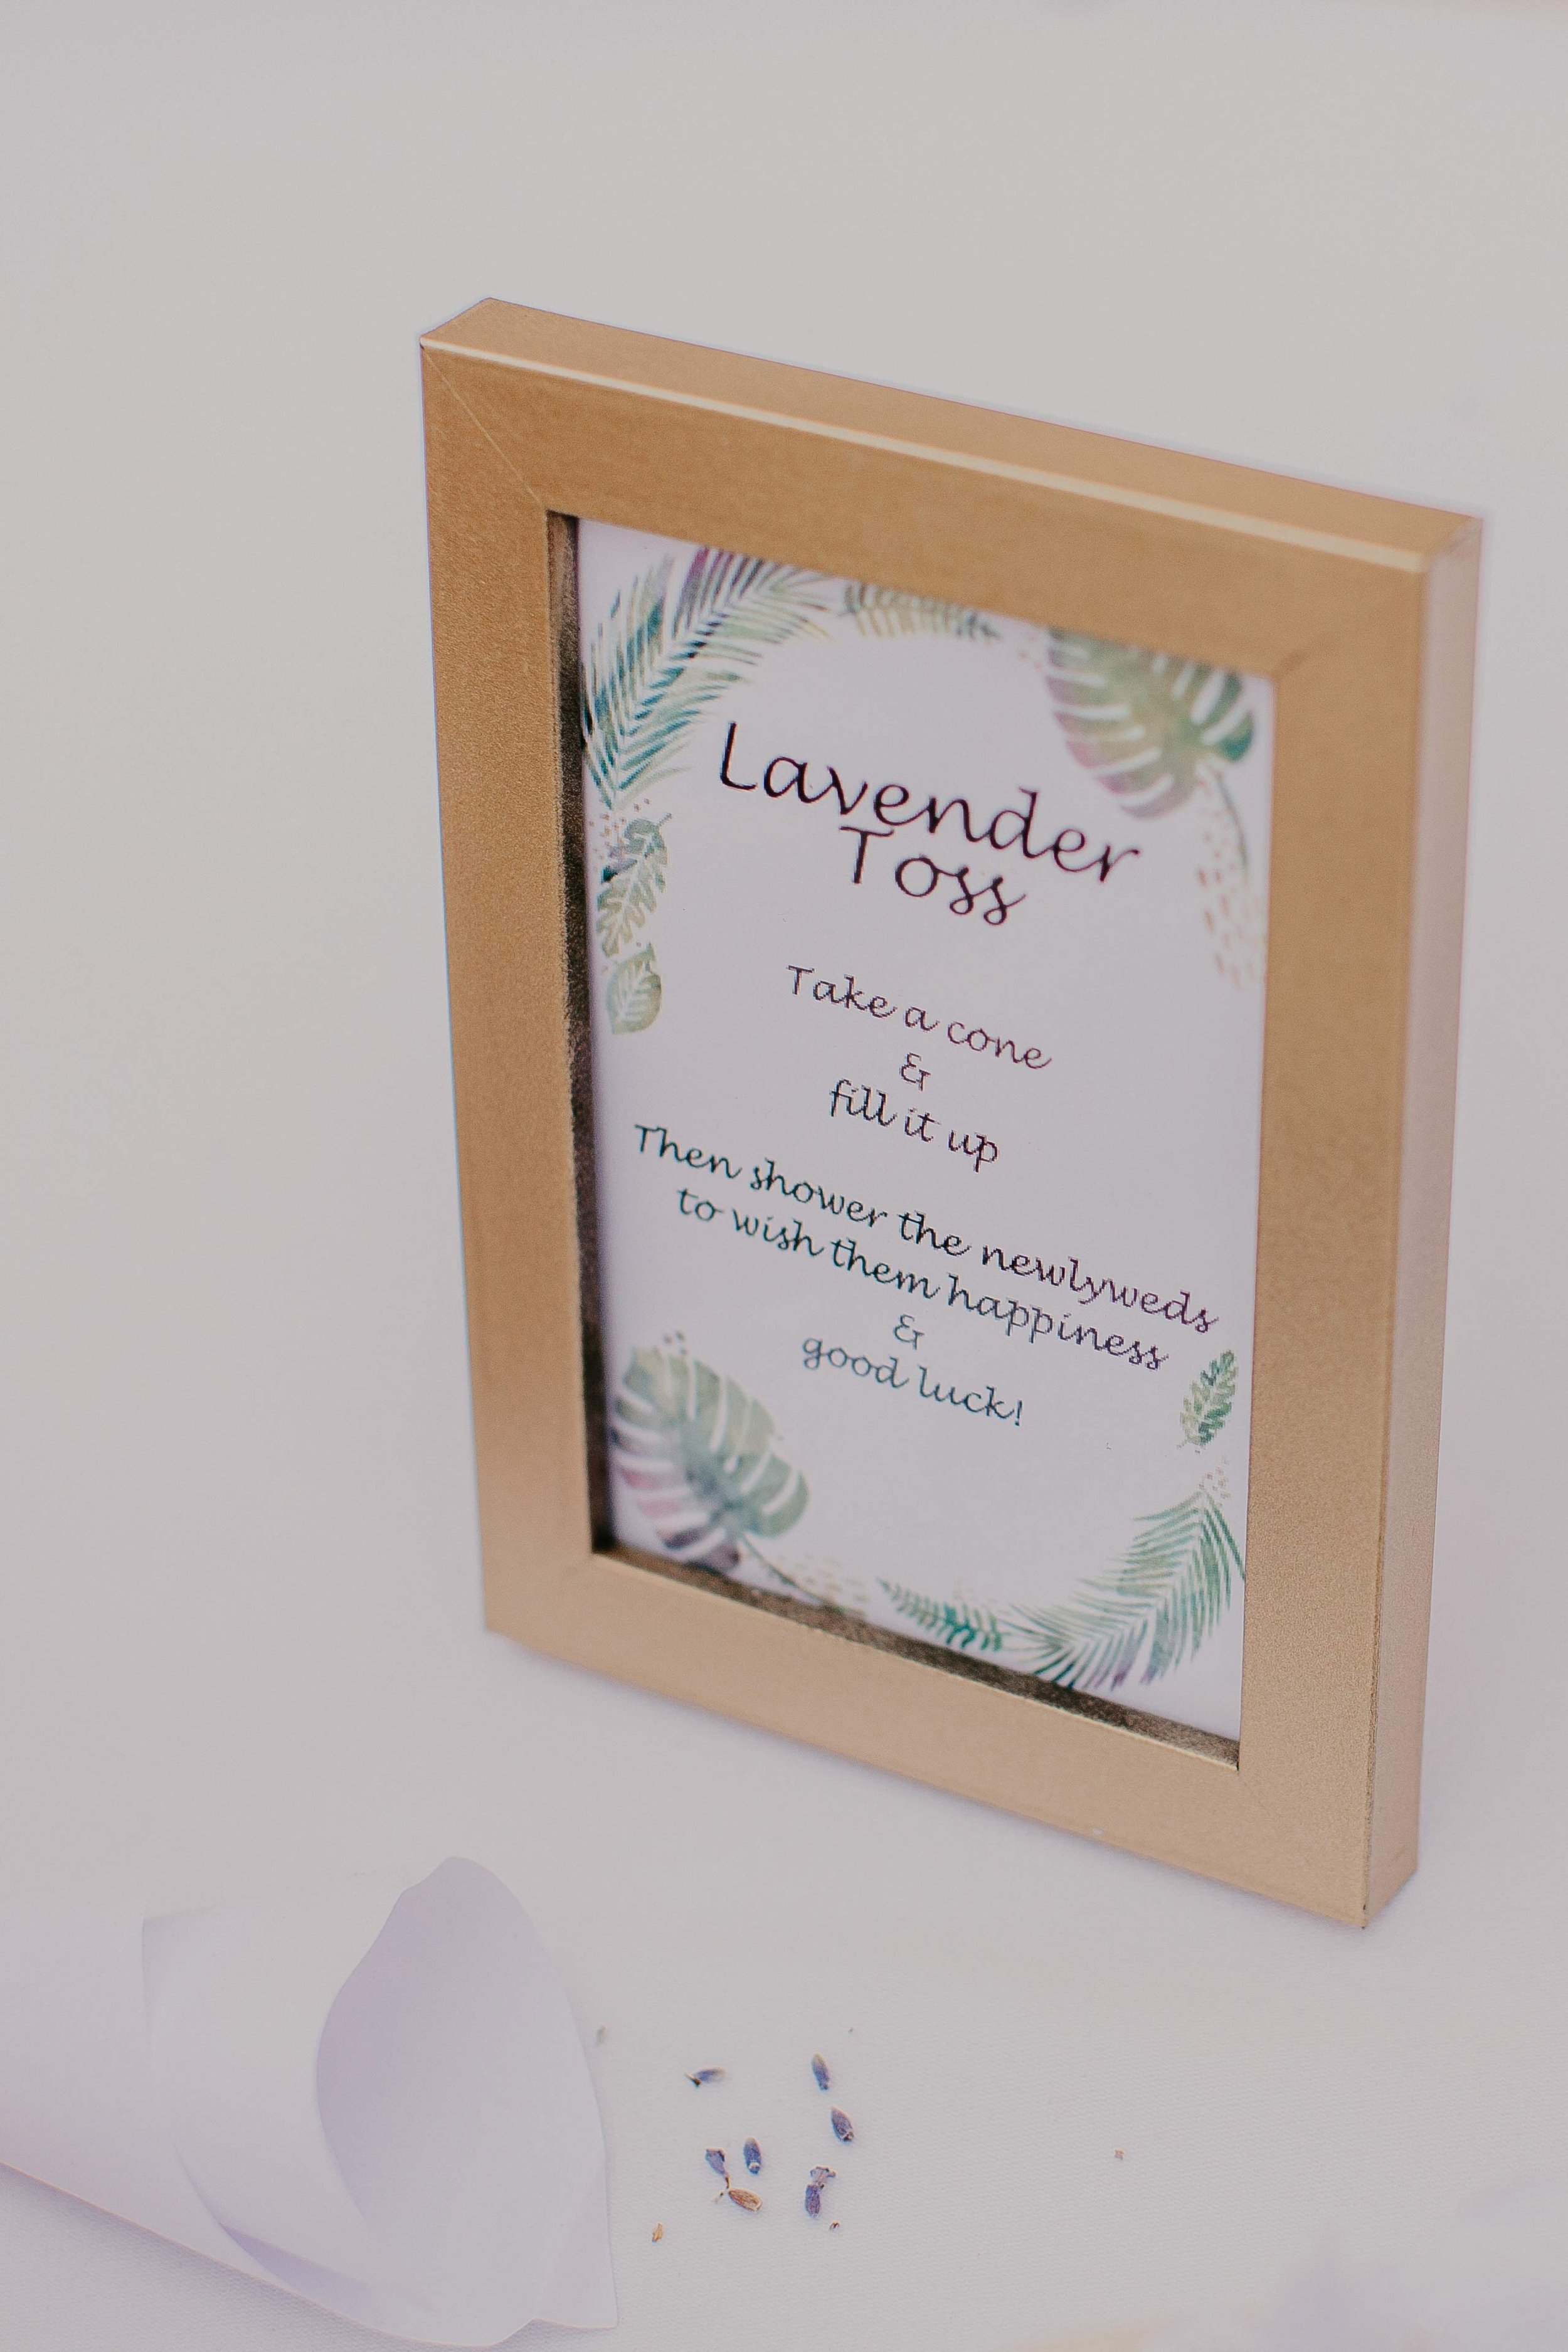 www.santabarbarawedding.com | Candice Marie Photography | Hilton Santa Barbara Beachfront Resort | Dalina Klan | Once in a Lifetime Weddings | Lavender Toss Instructions